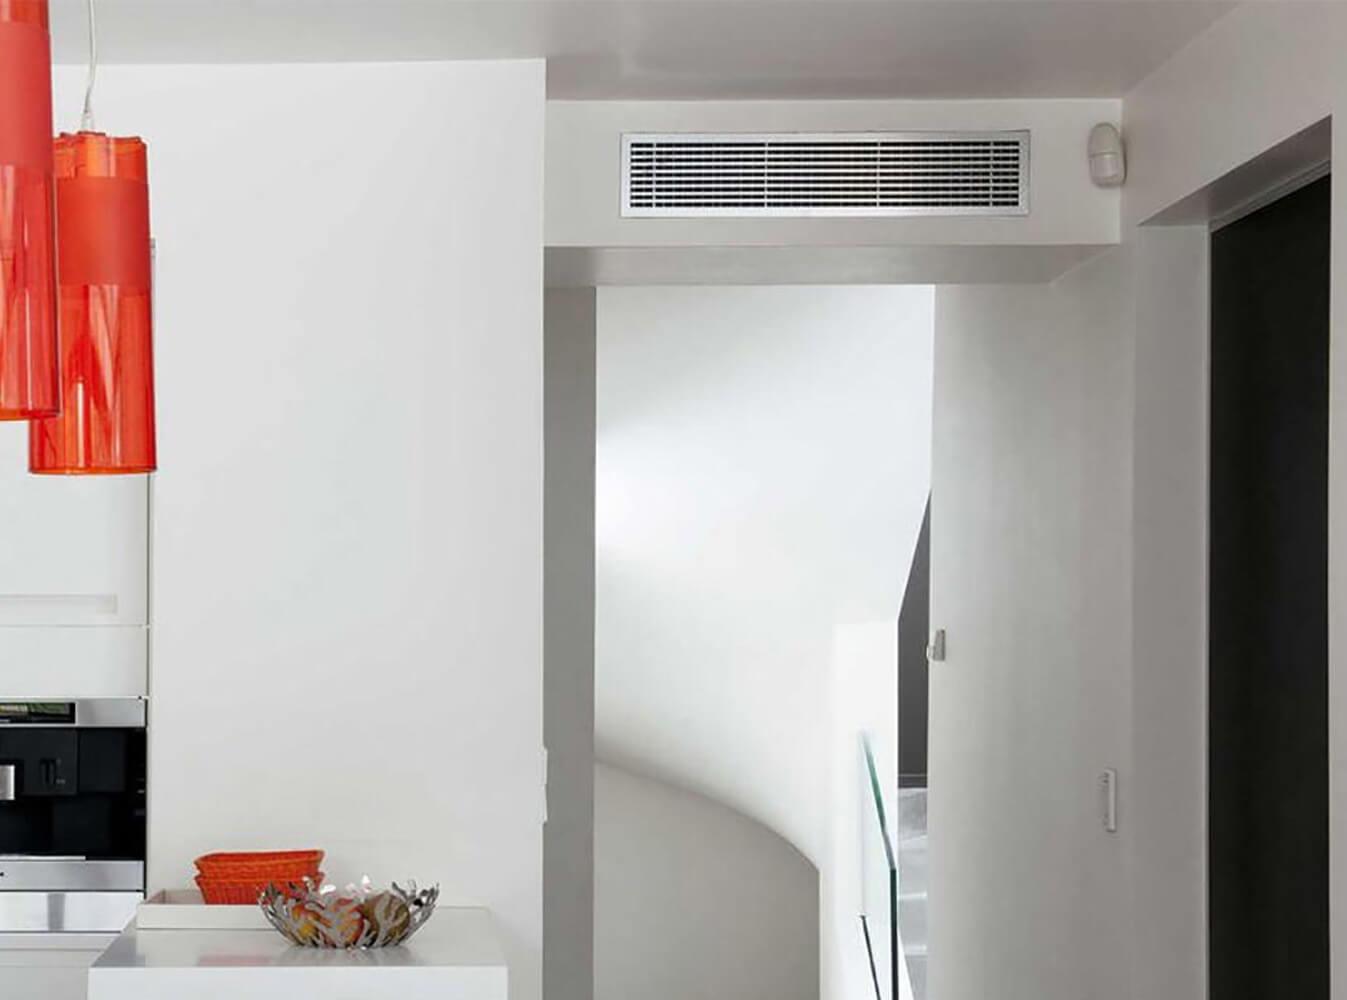 Installation Chauffage réversible gainable Mitsubishi Saint jean de védas - Sols Energies Bains